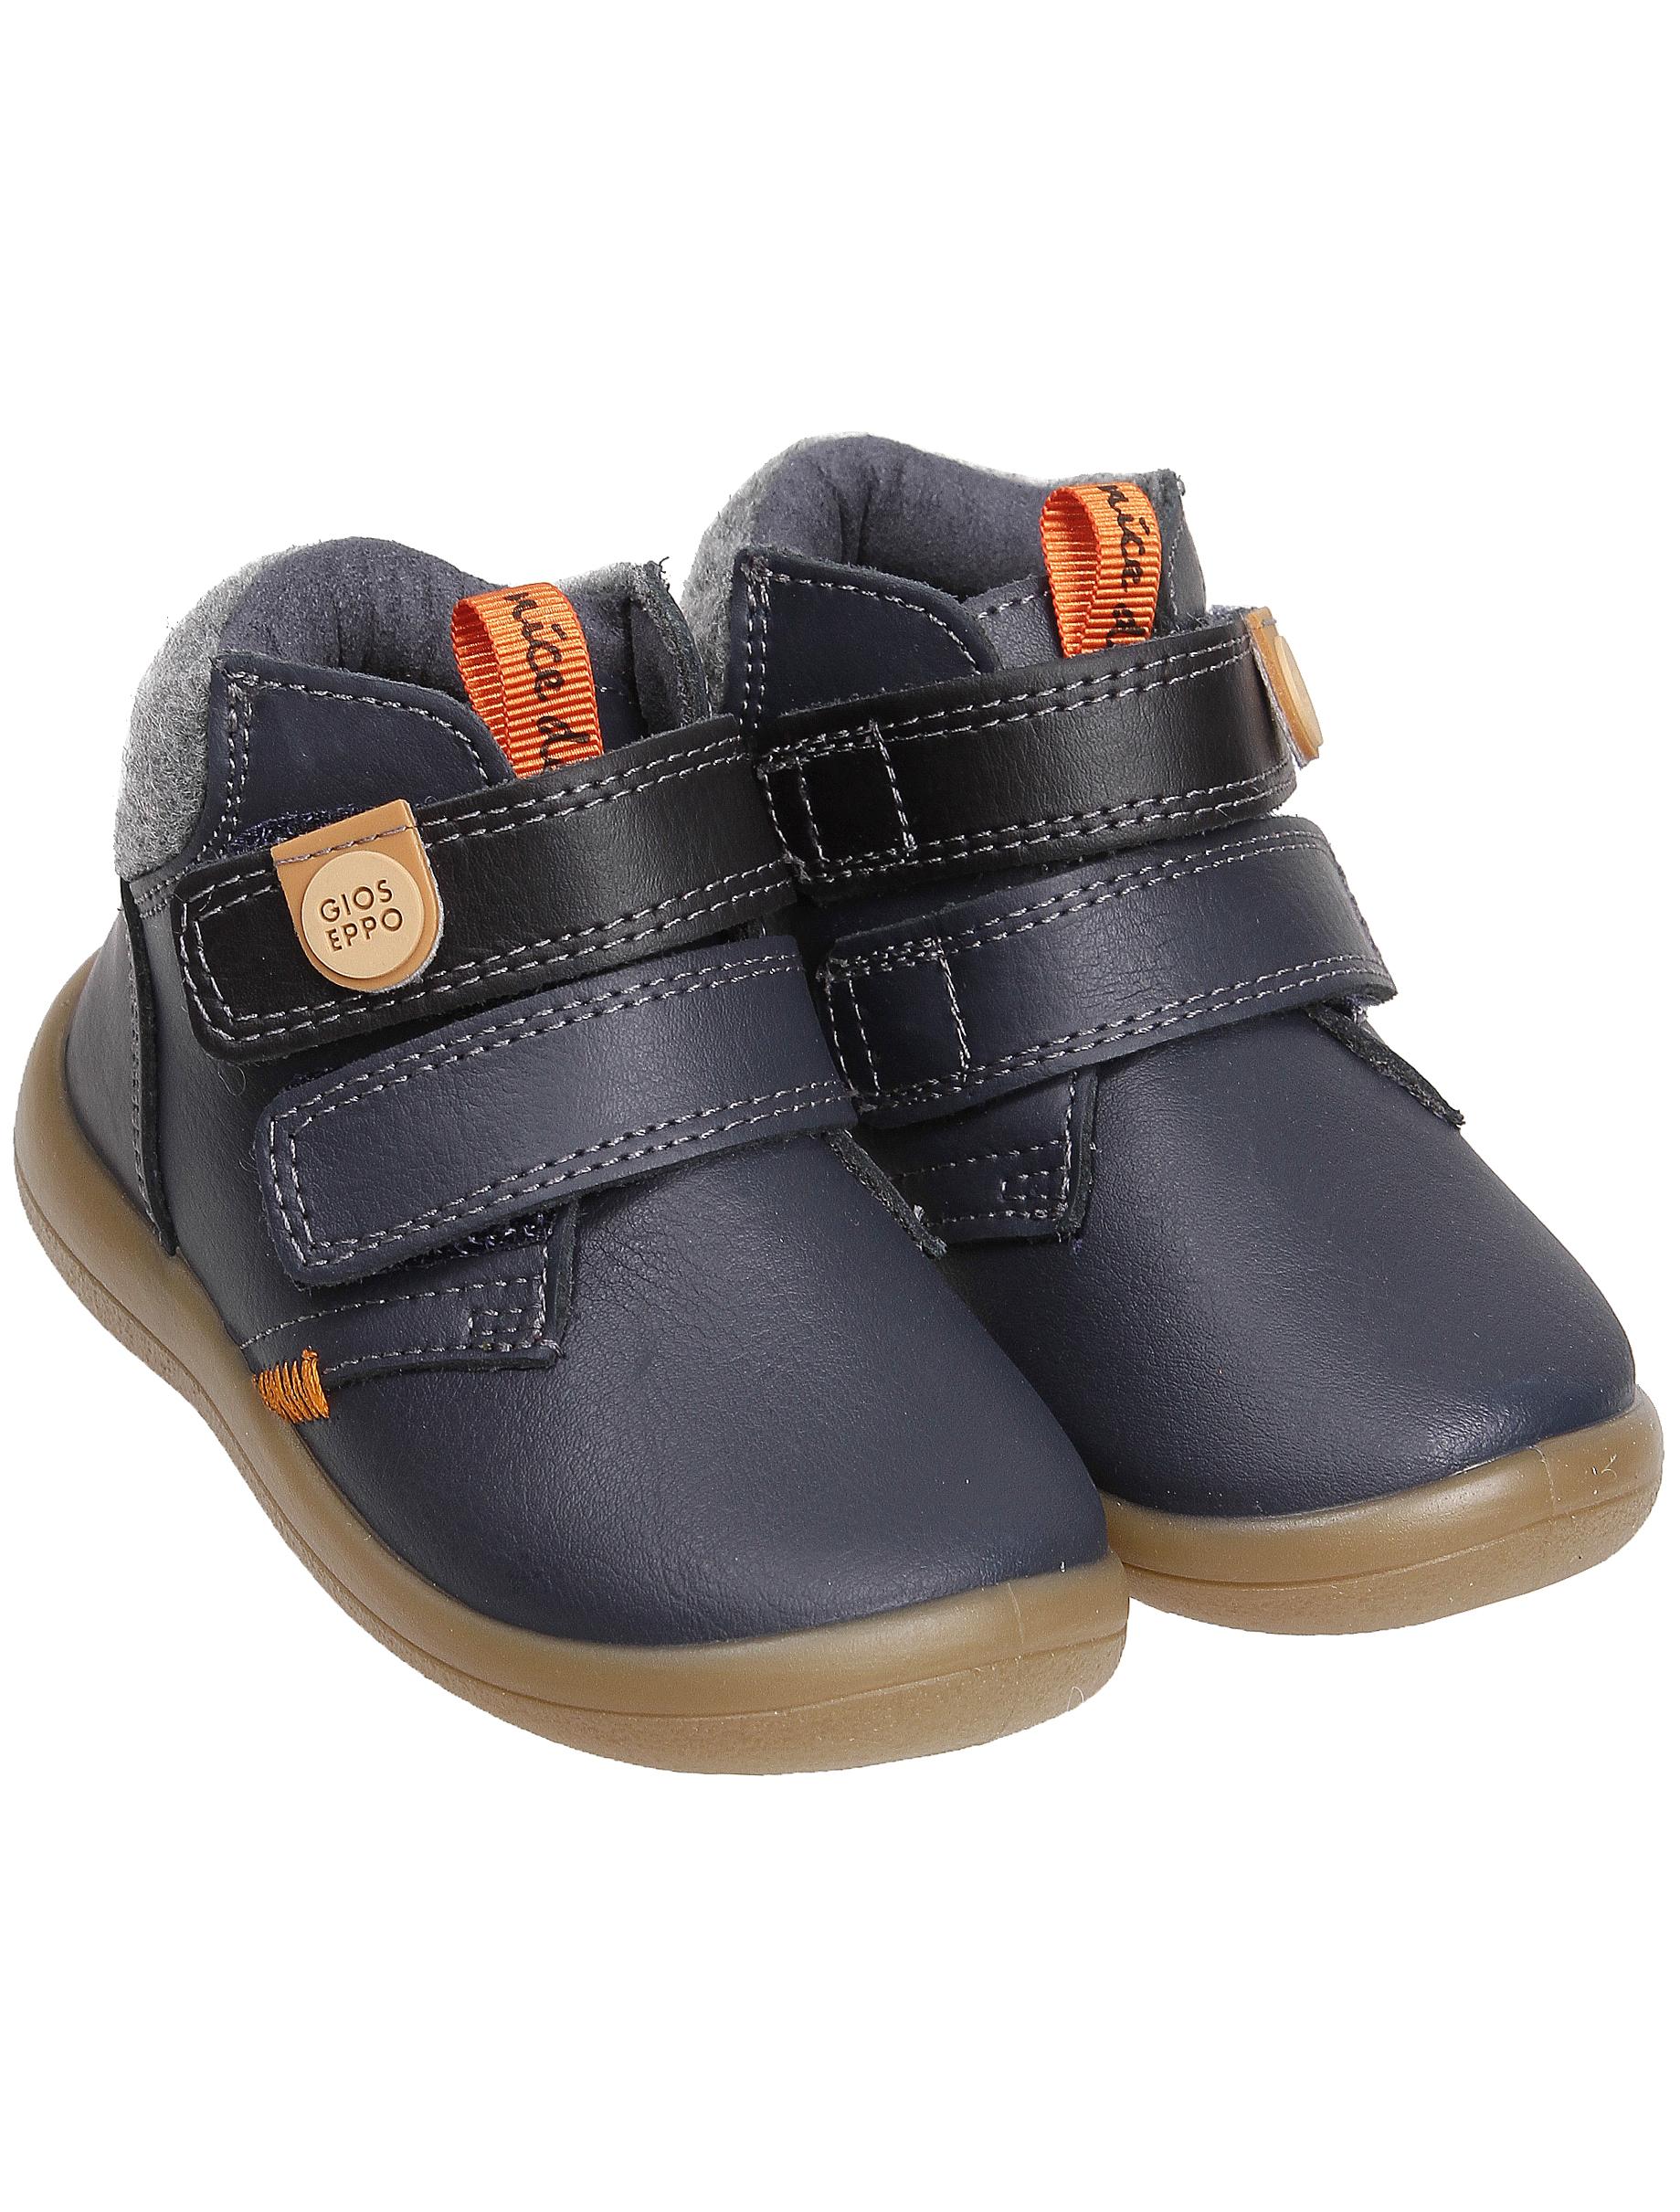 Купить 2120985, Ботинки GIOSEPPO, синий, Мужской, 2031419980209